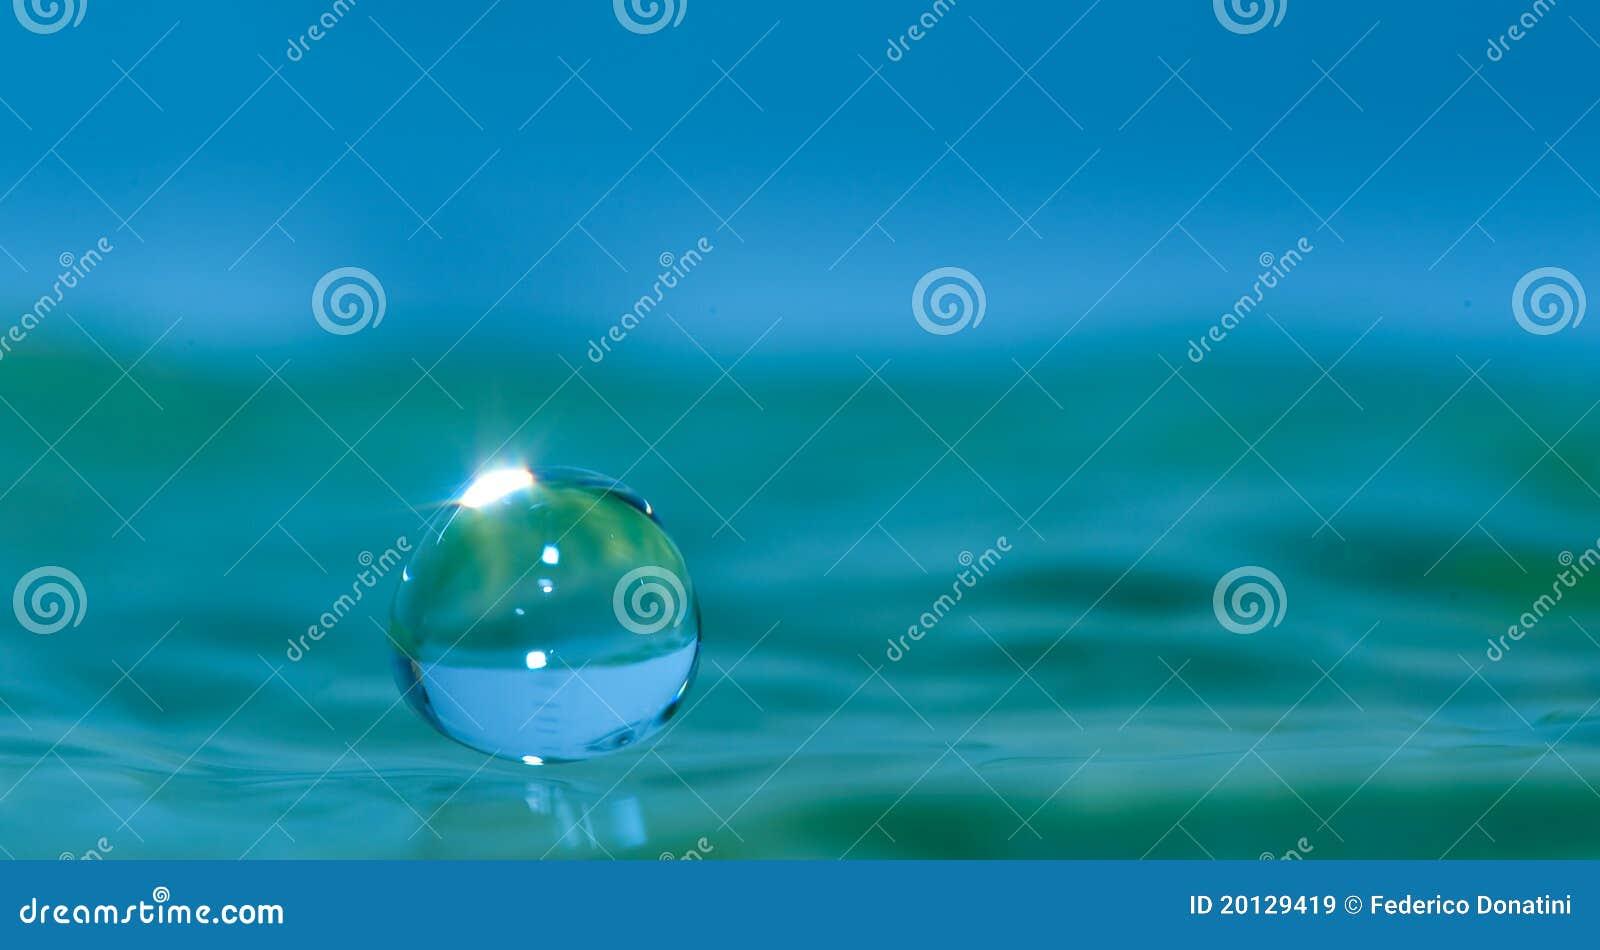 Water droplet